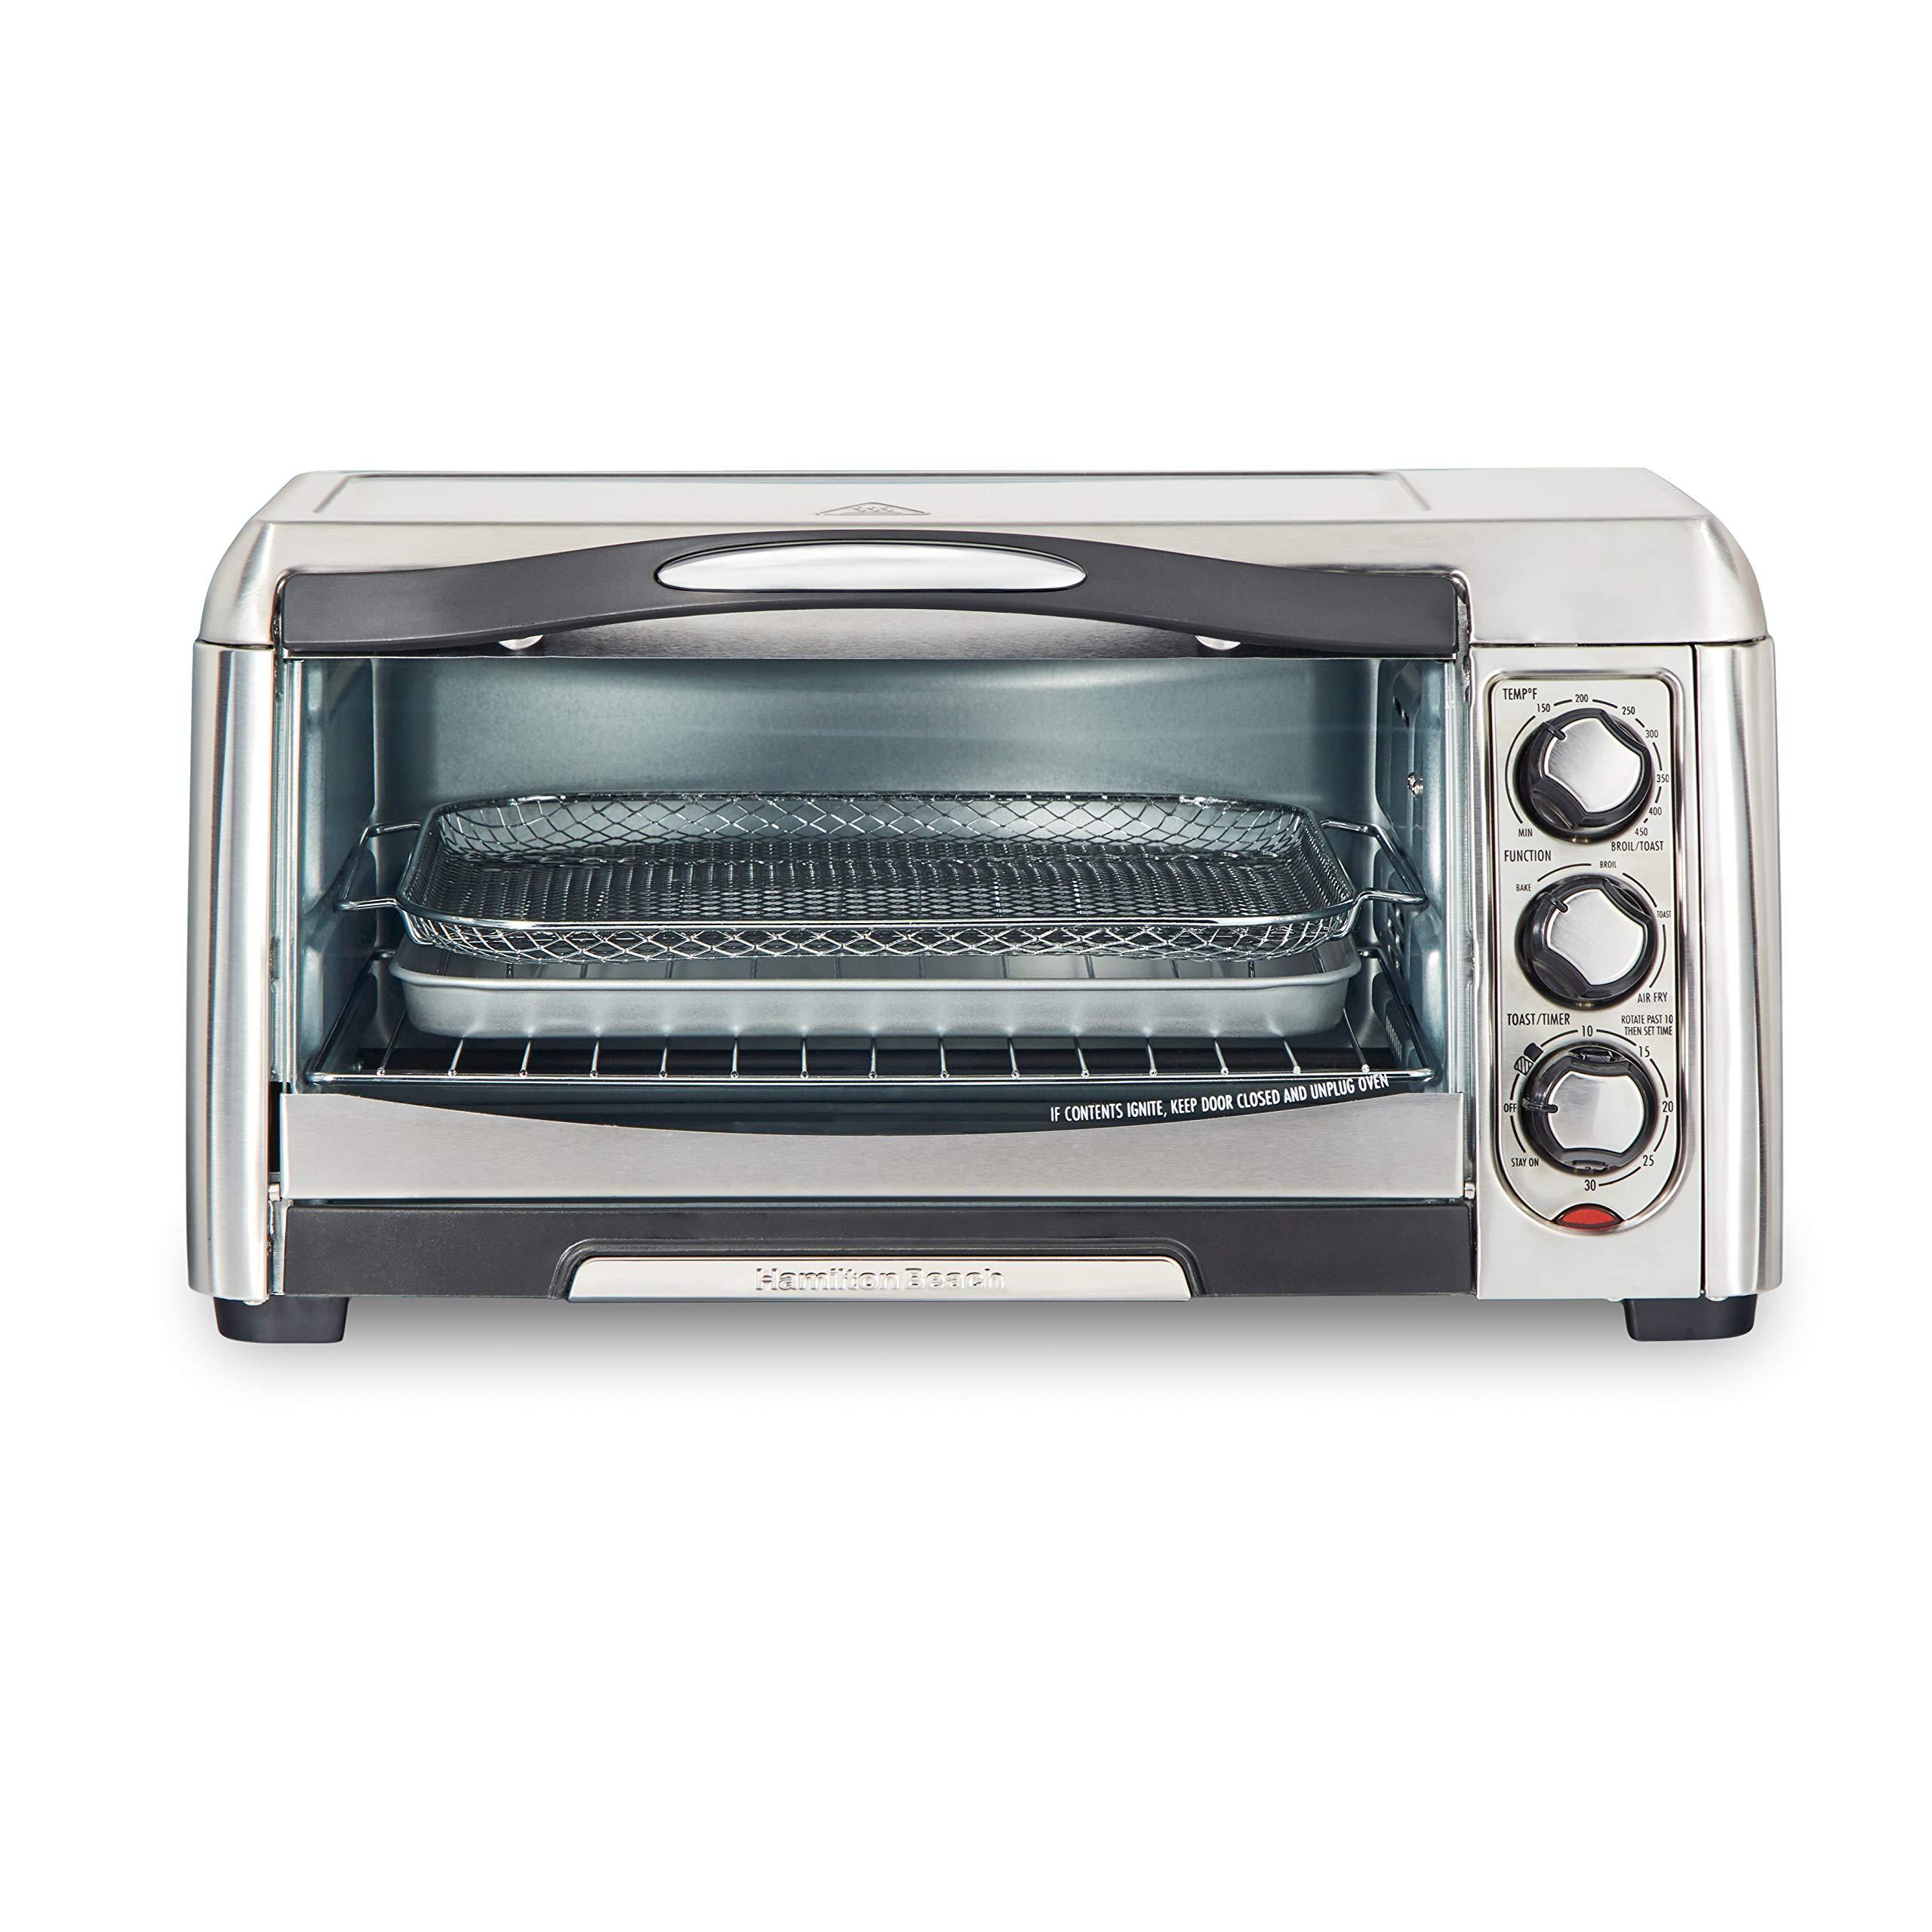 Hamilton Beach 31323 Sure-Crisp Air Fry Toaster Oven, 6 Slice Capacity, Stainless Steel by Hamilton Beach